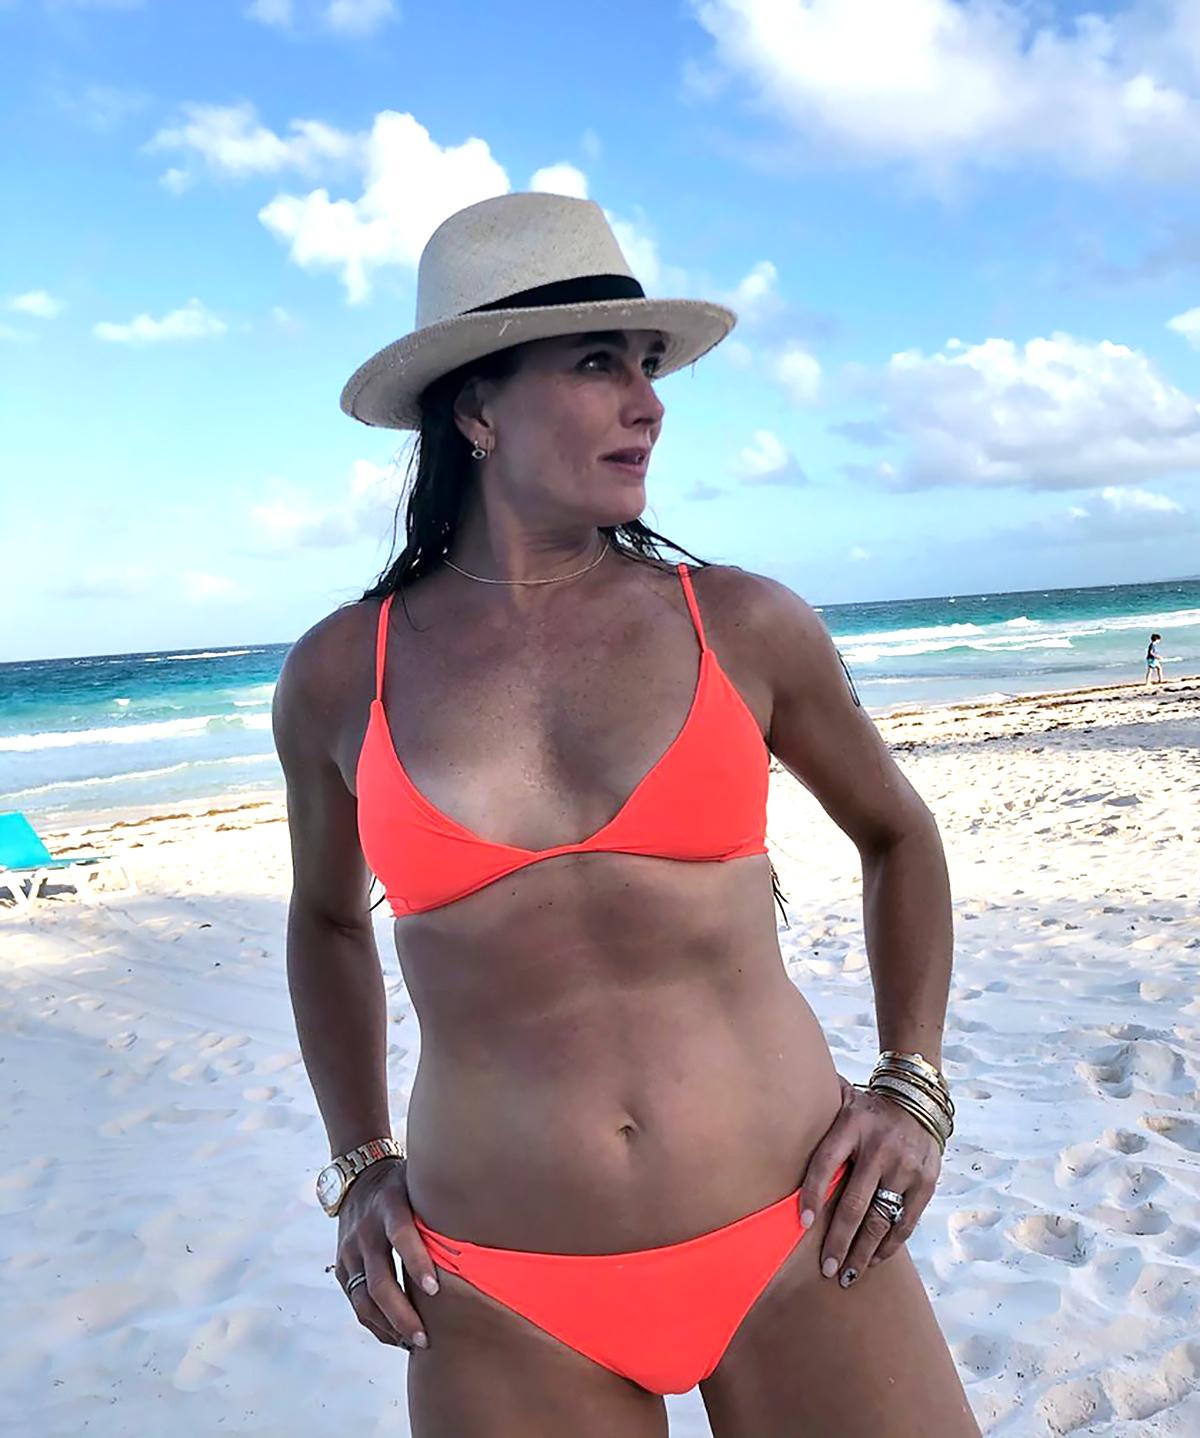 Men in panties at beach Best Celebrity Beach Bikini Swimsuit Bodies Of 2020 Pics